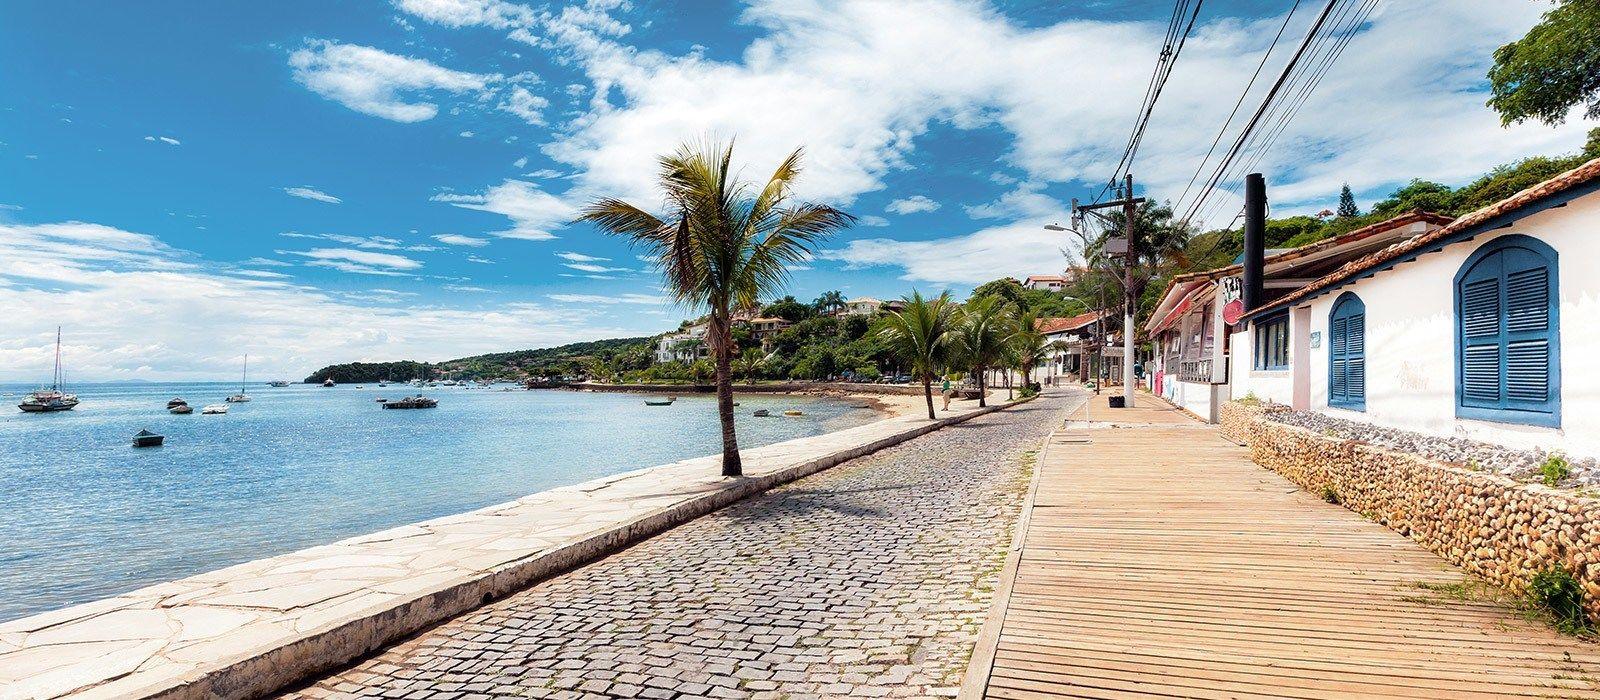 Destination Buzios Brazil